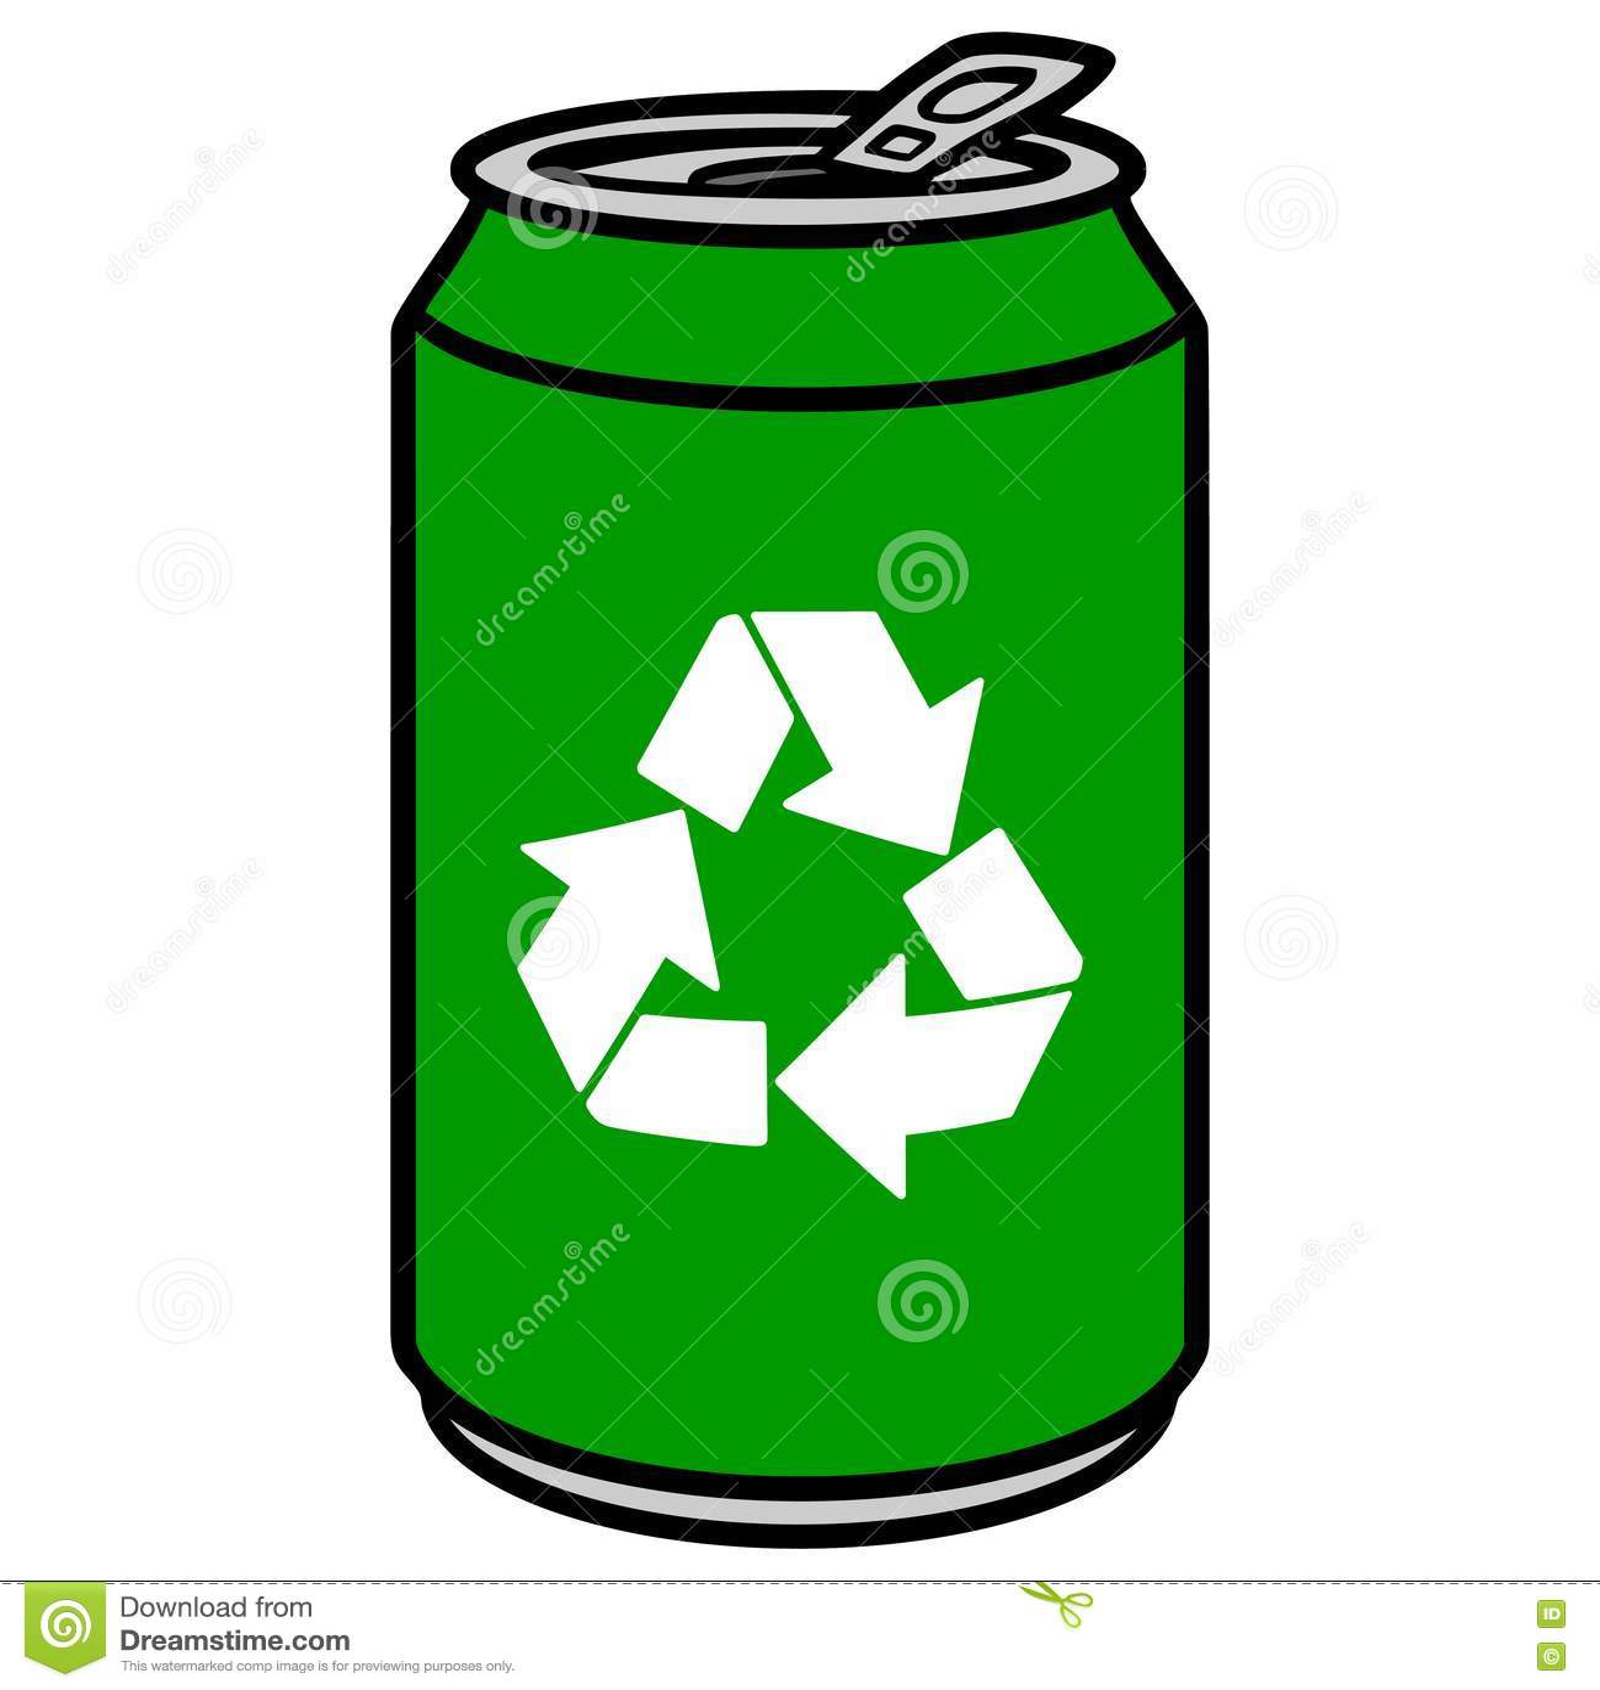 aluminum can recycling symbol stock illustrations 629 aluminum can